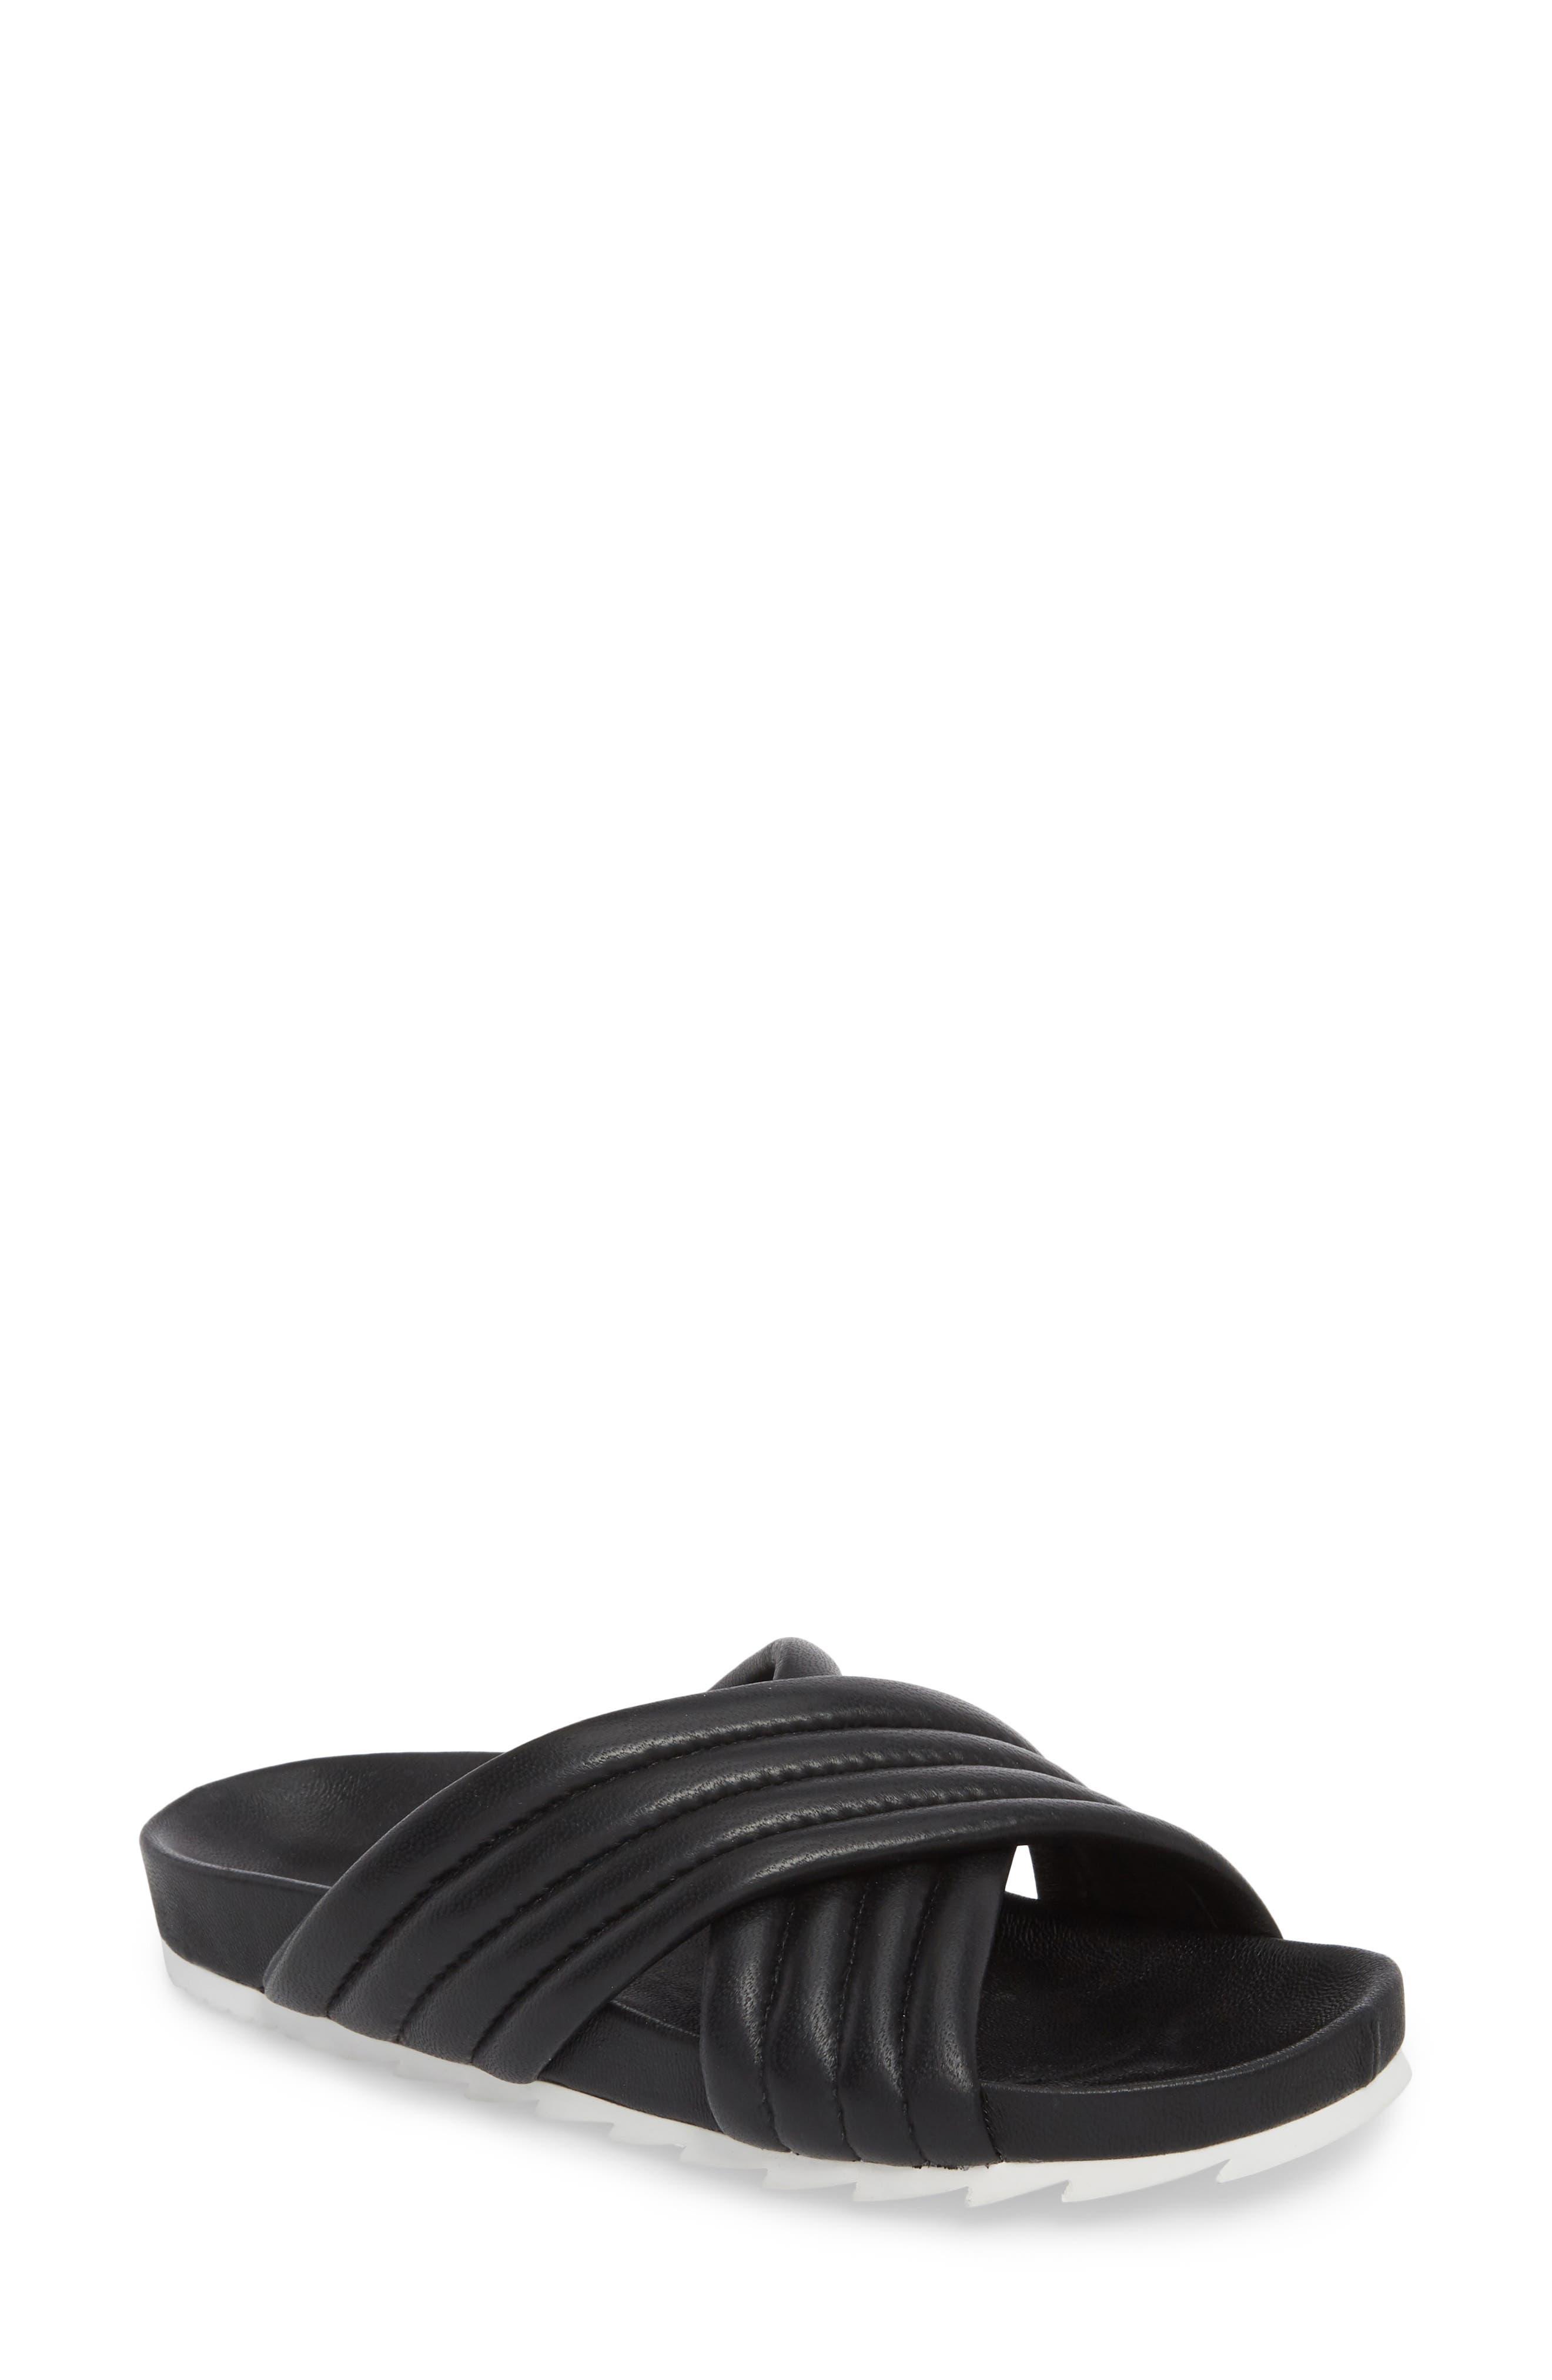 Easy Slide Sandal,                             Main thumbnail 1, color,                             BLACK LEATHER